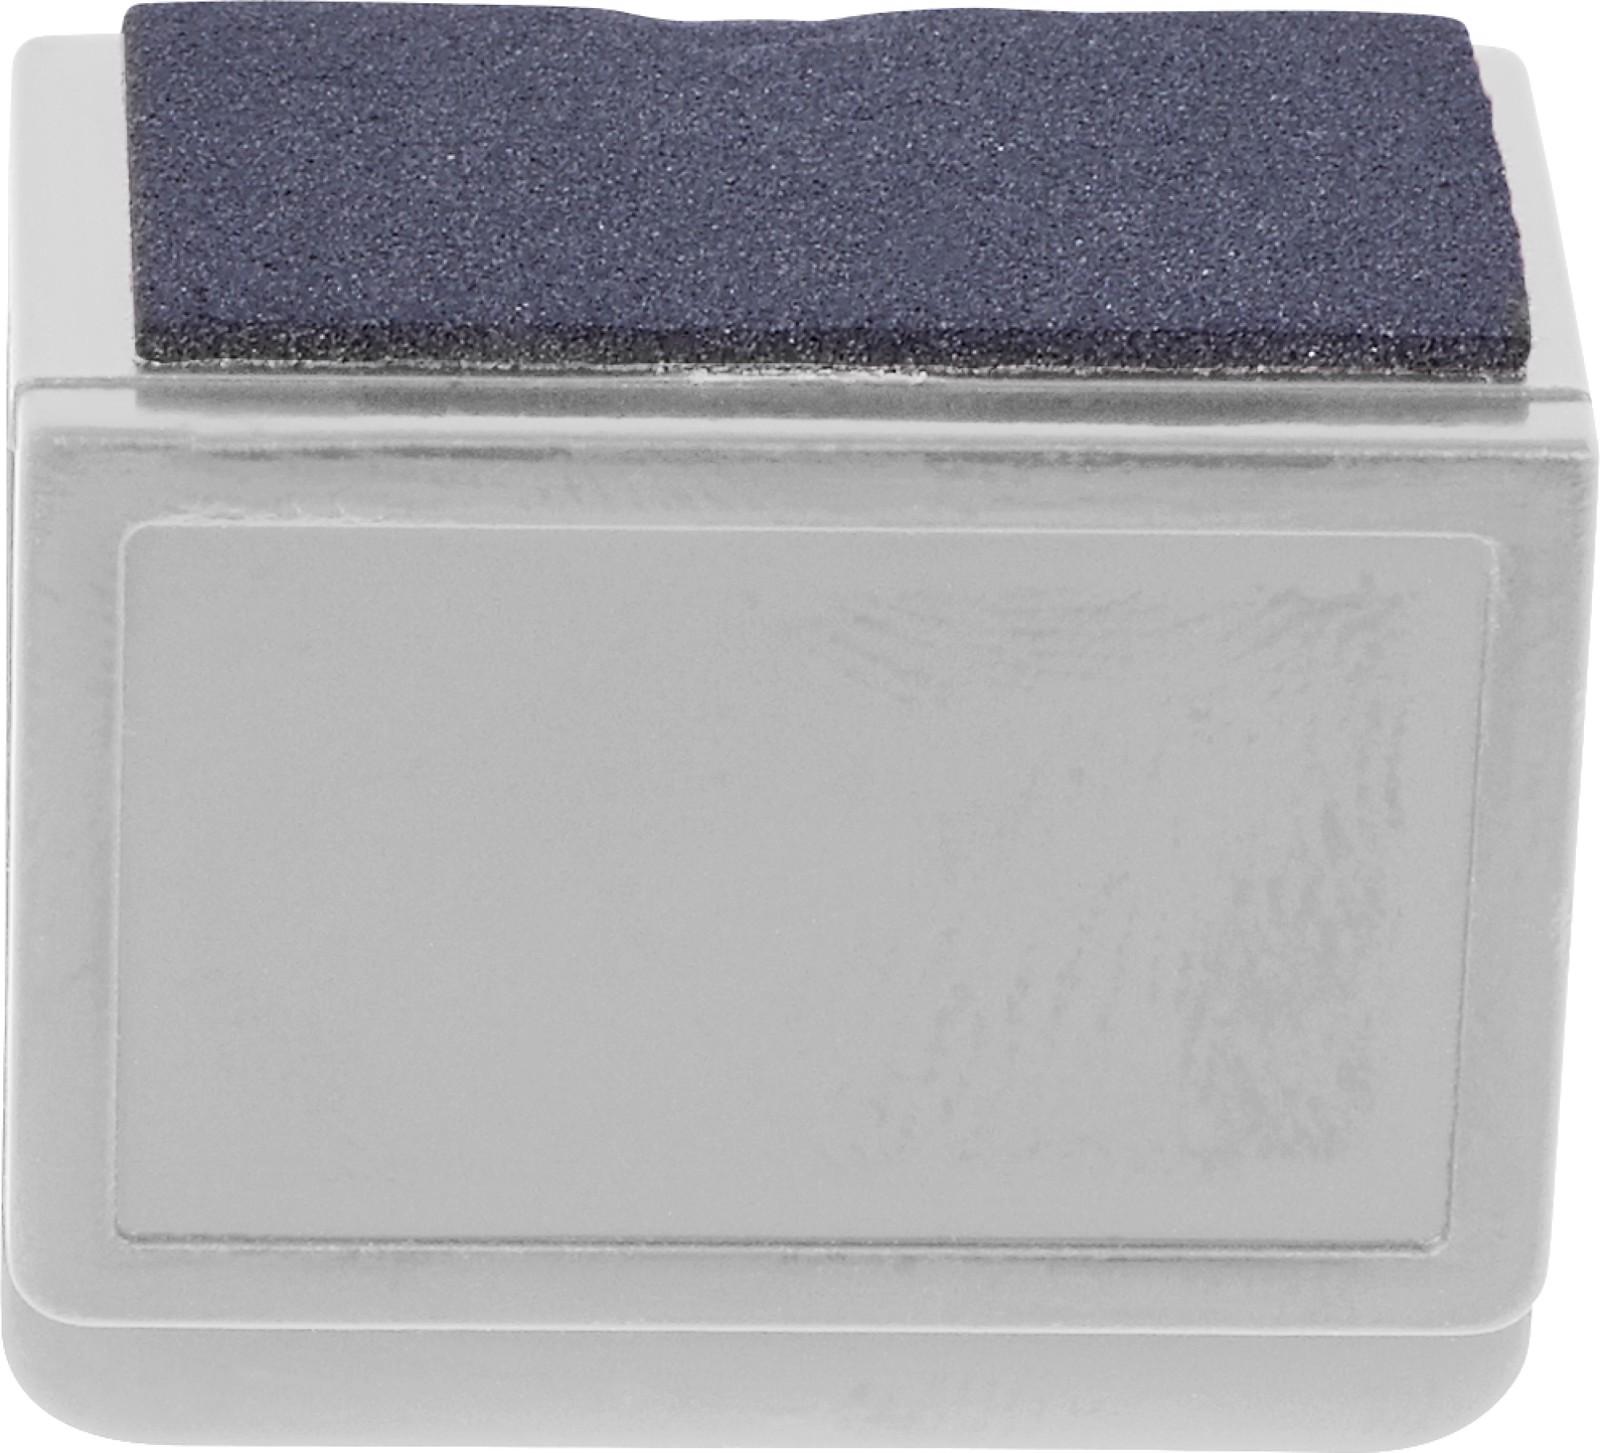 ABS webcam cover - Grey